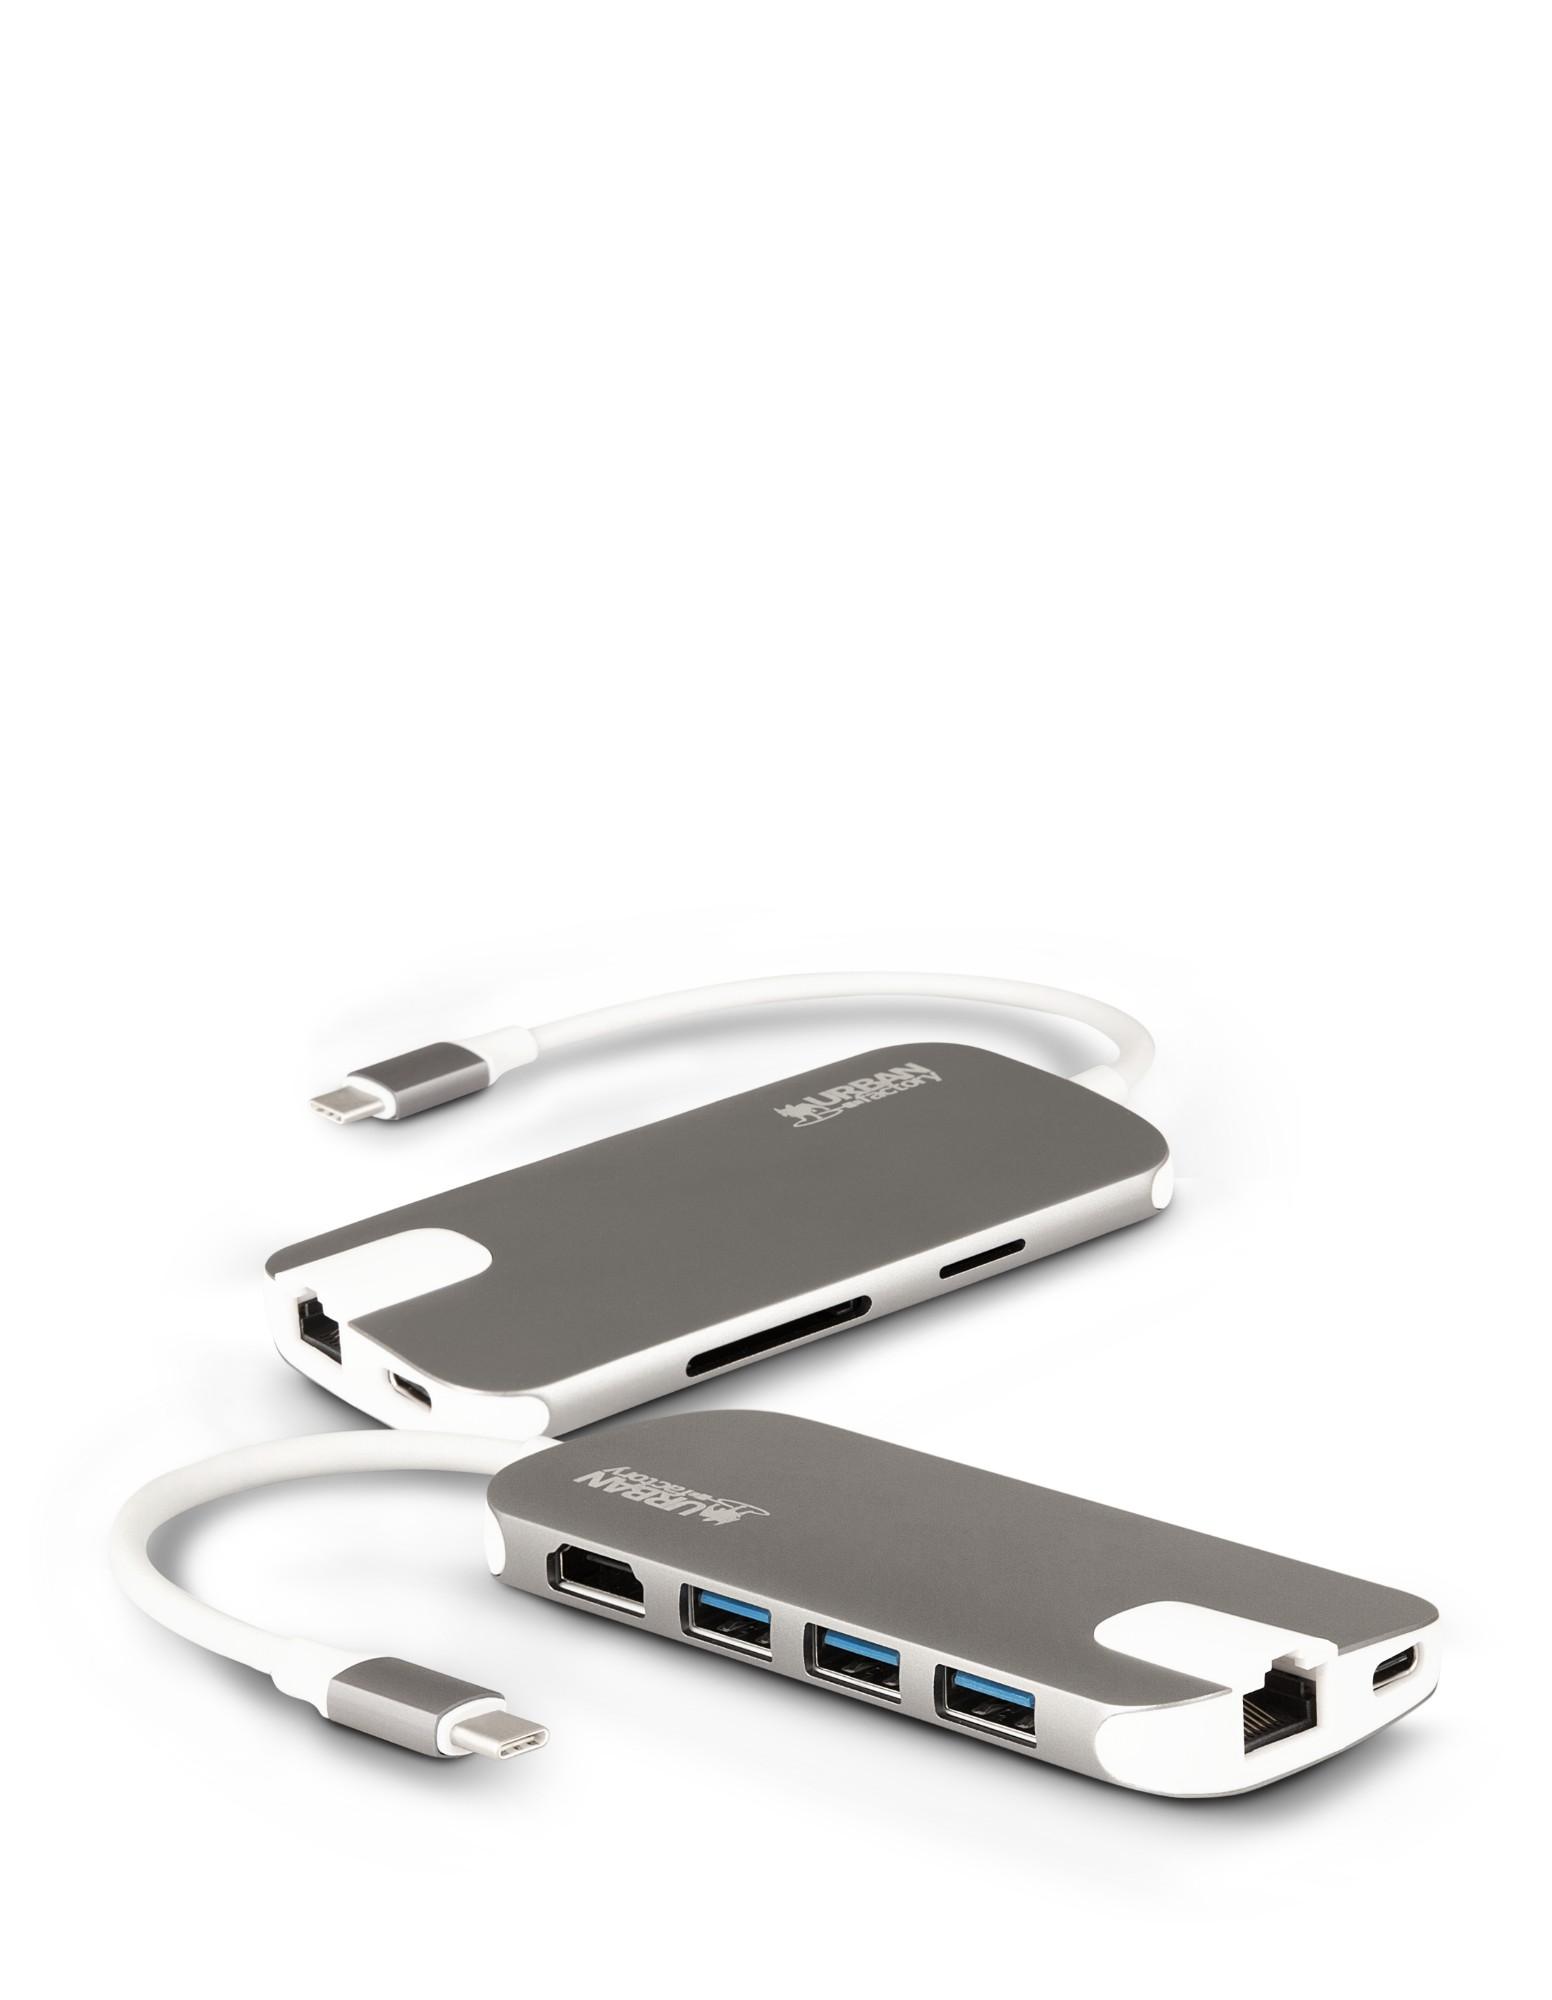 USB-C DOCK STATION INPUTUSB-C OUT:1X USB-C3X USB 3.0HDMI 4K